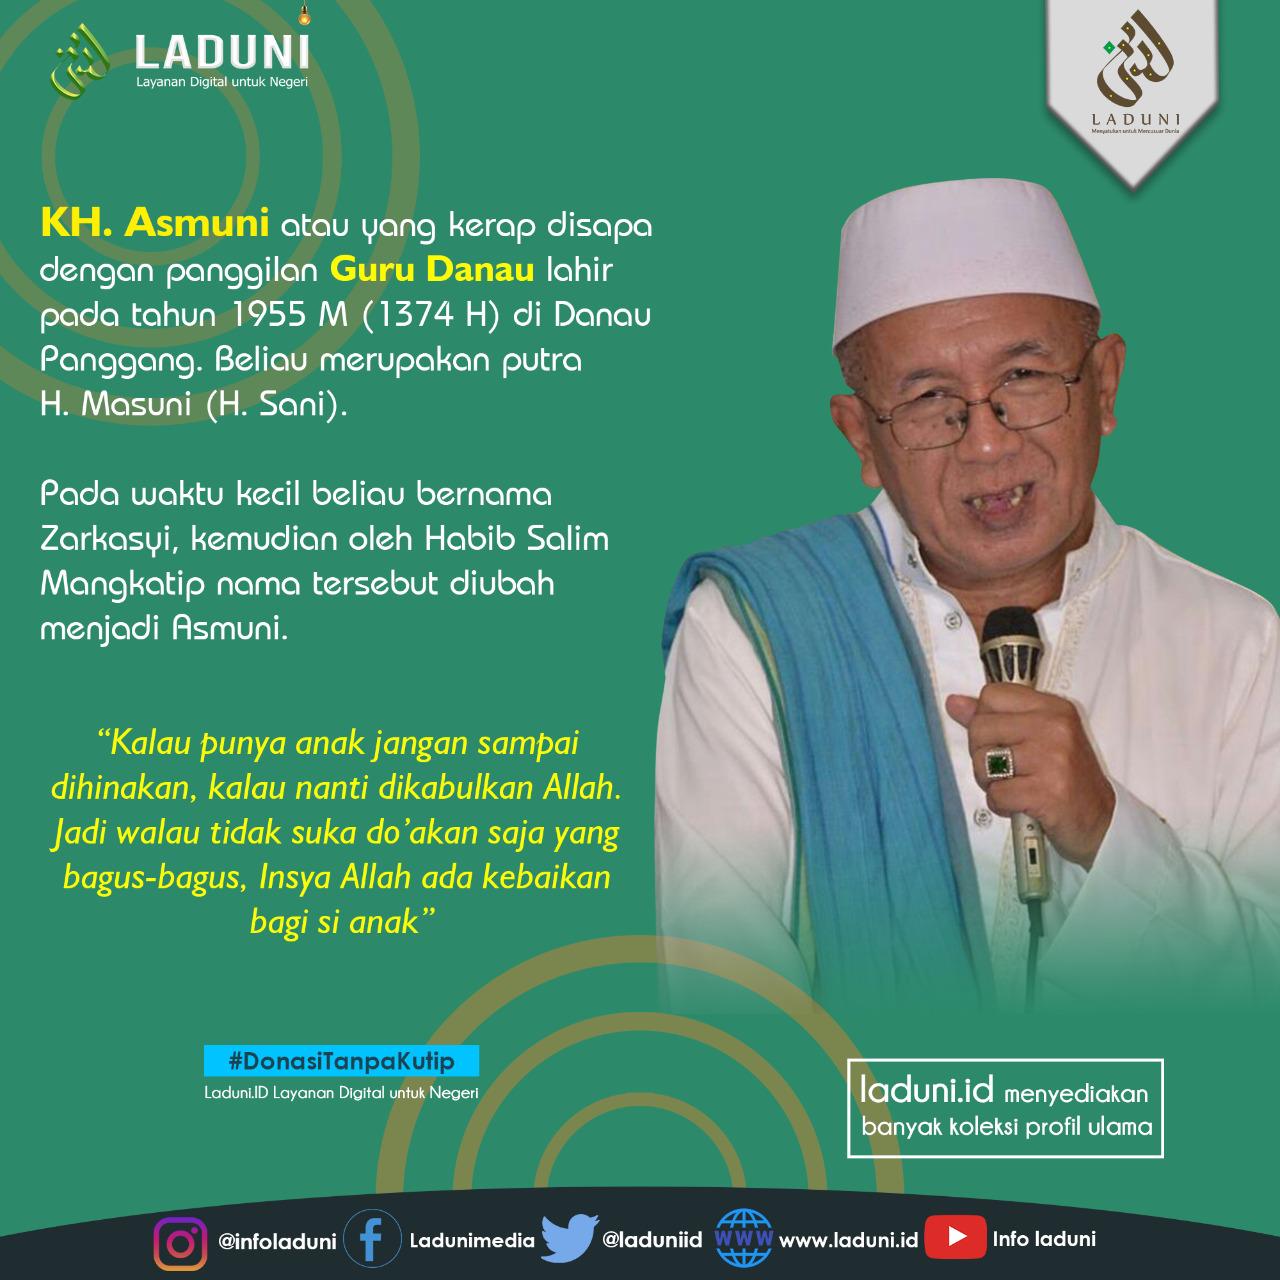 Biografi KH. Asmuni (Guru Danau)